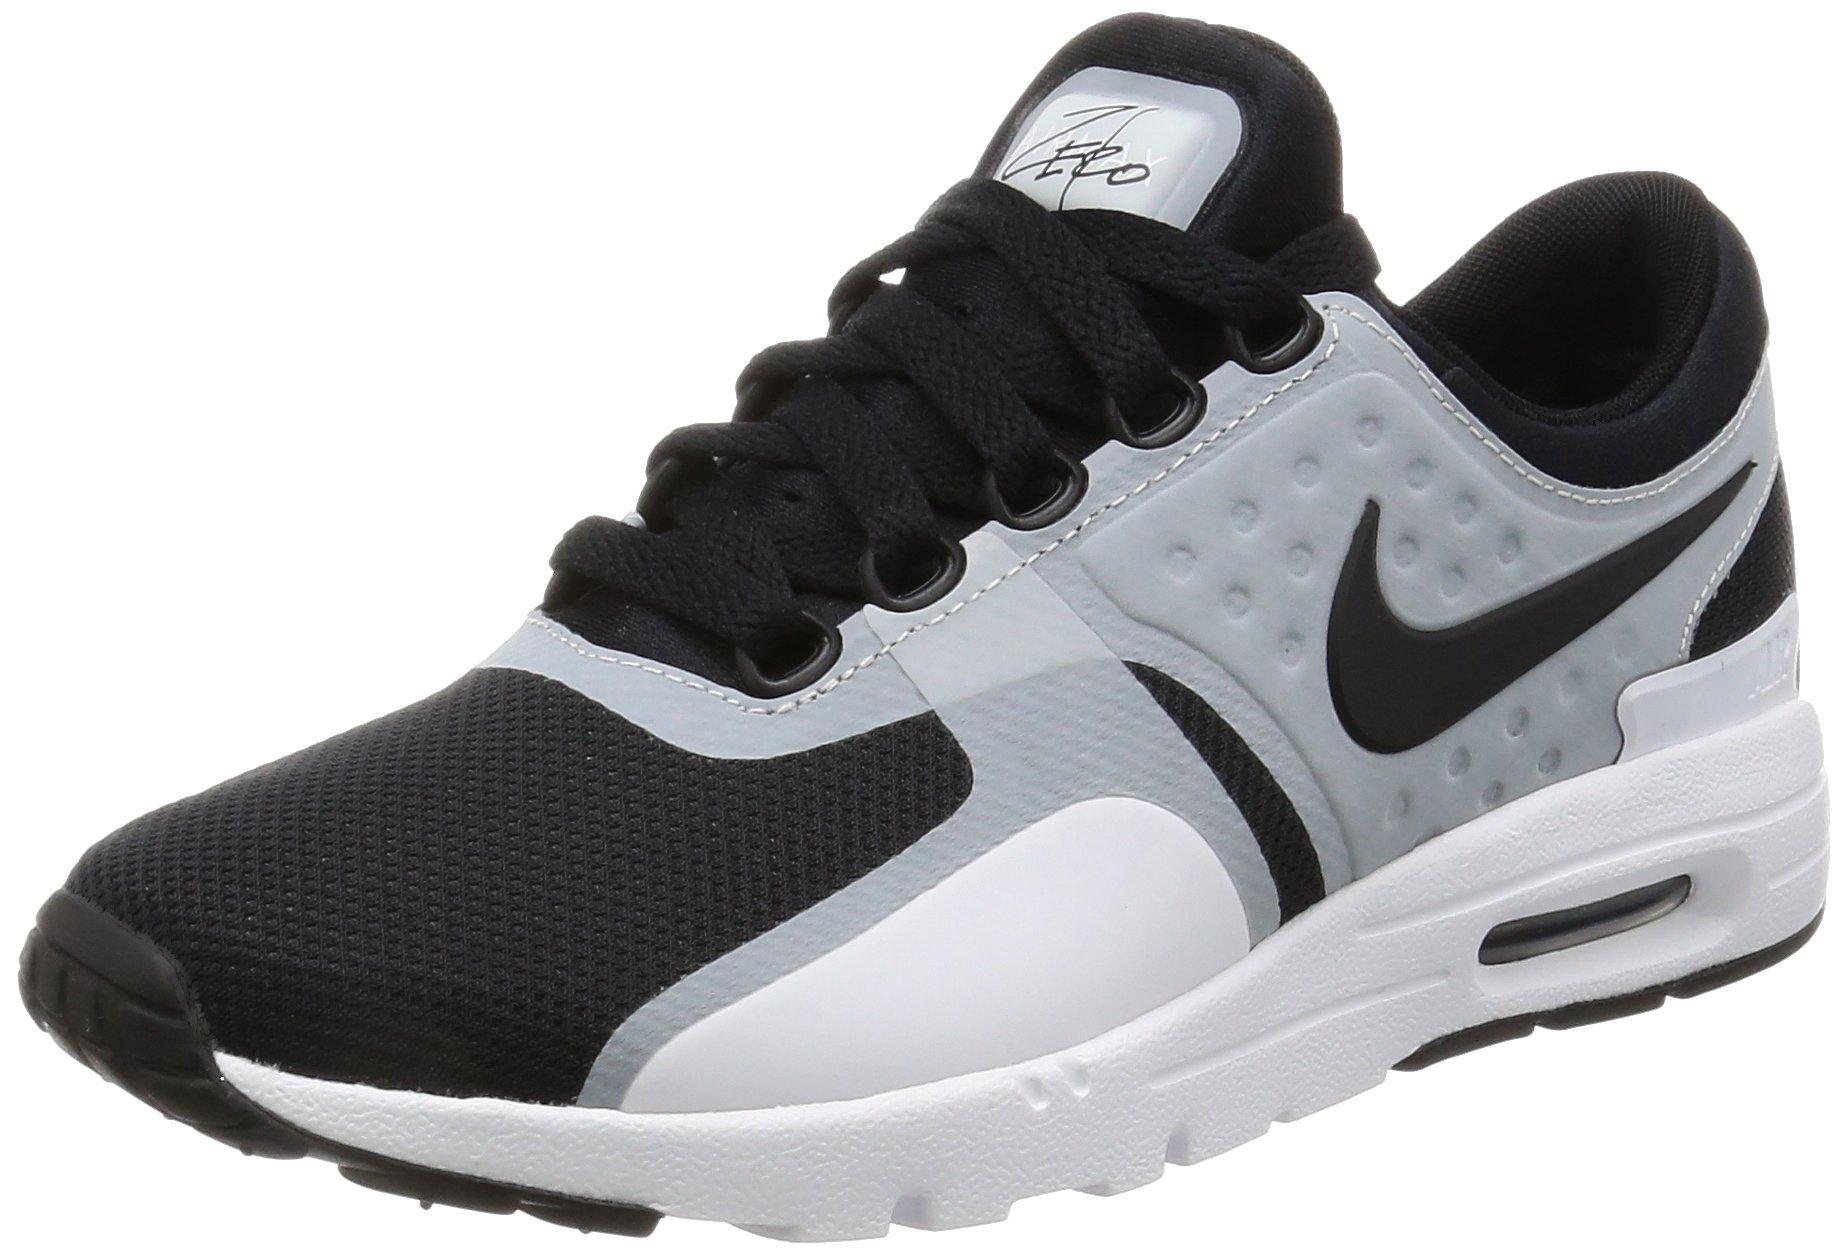 newest e6c1a 60b6f Galleon - Nike Womens Air Max Zero White Black Running Shoe 6 Women US